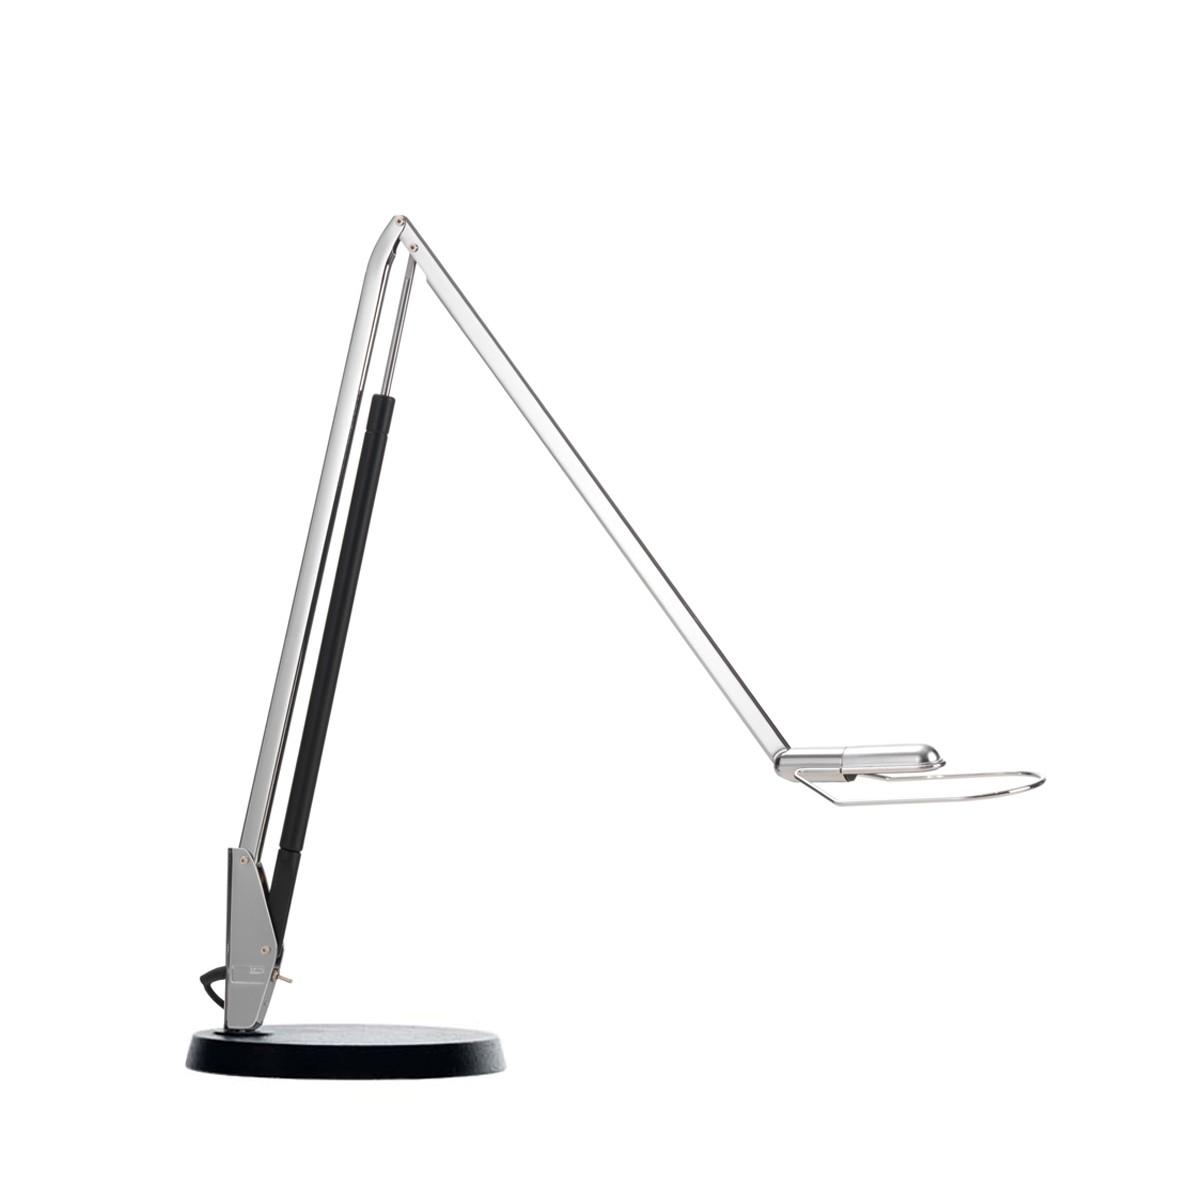 Belux Liftolino-03 LED Tischleuchte, mit Dimmer, Chrom